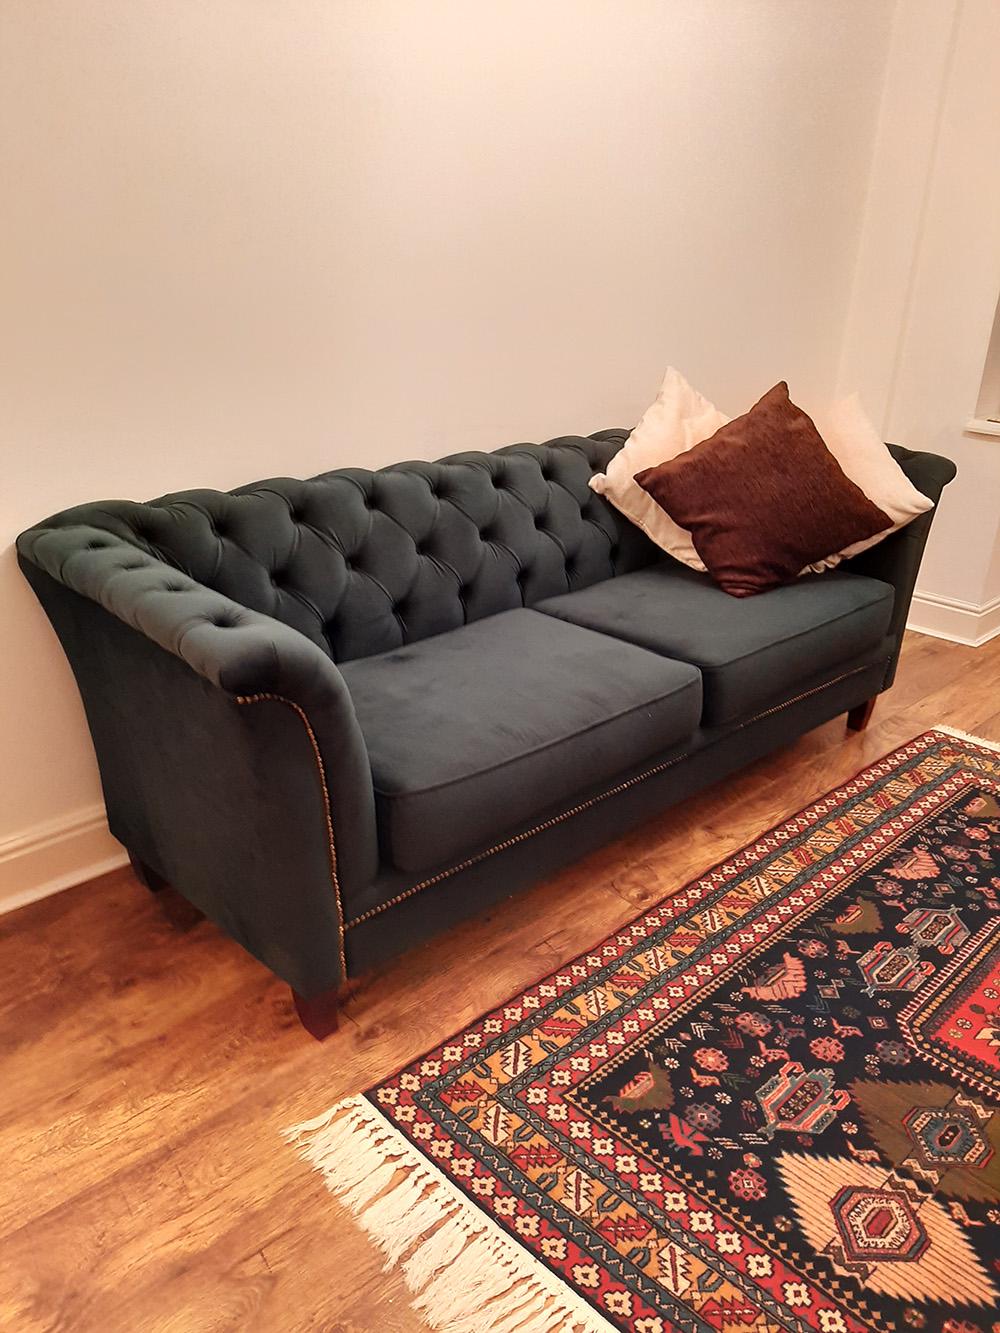 Welurowa sofa Karin ze złotymi elementami